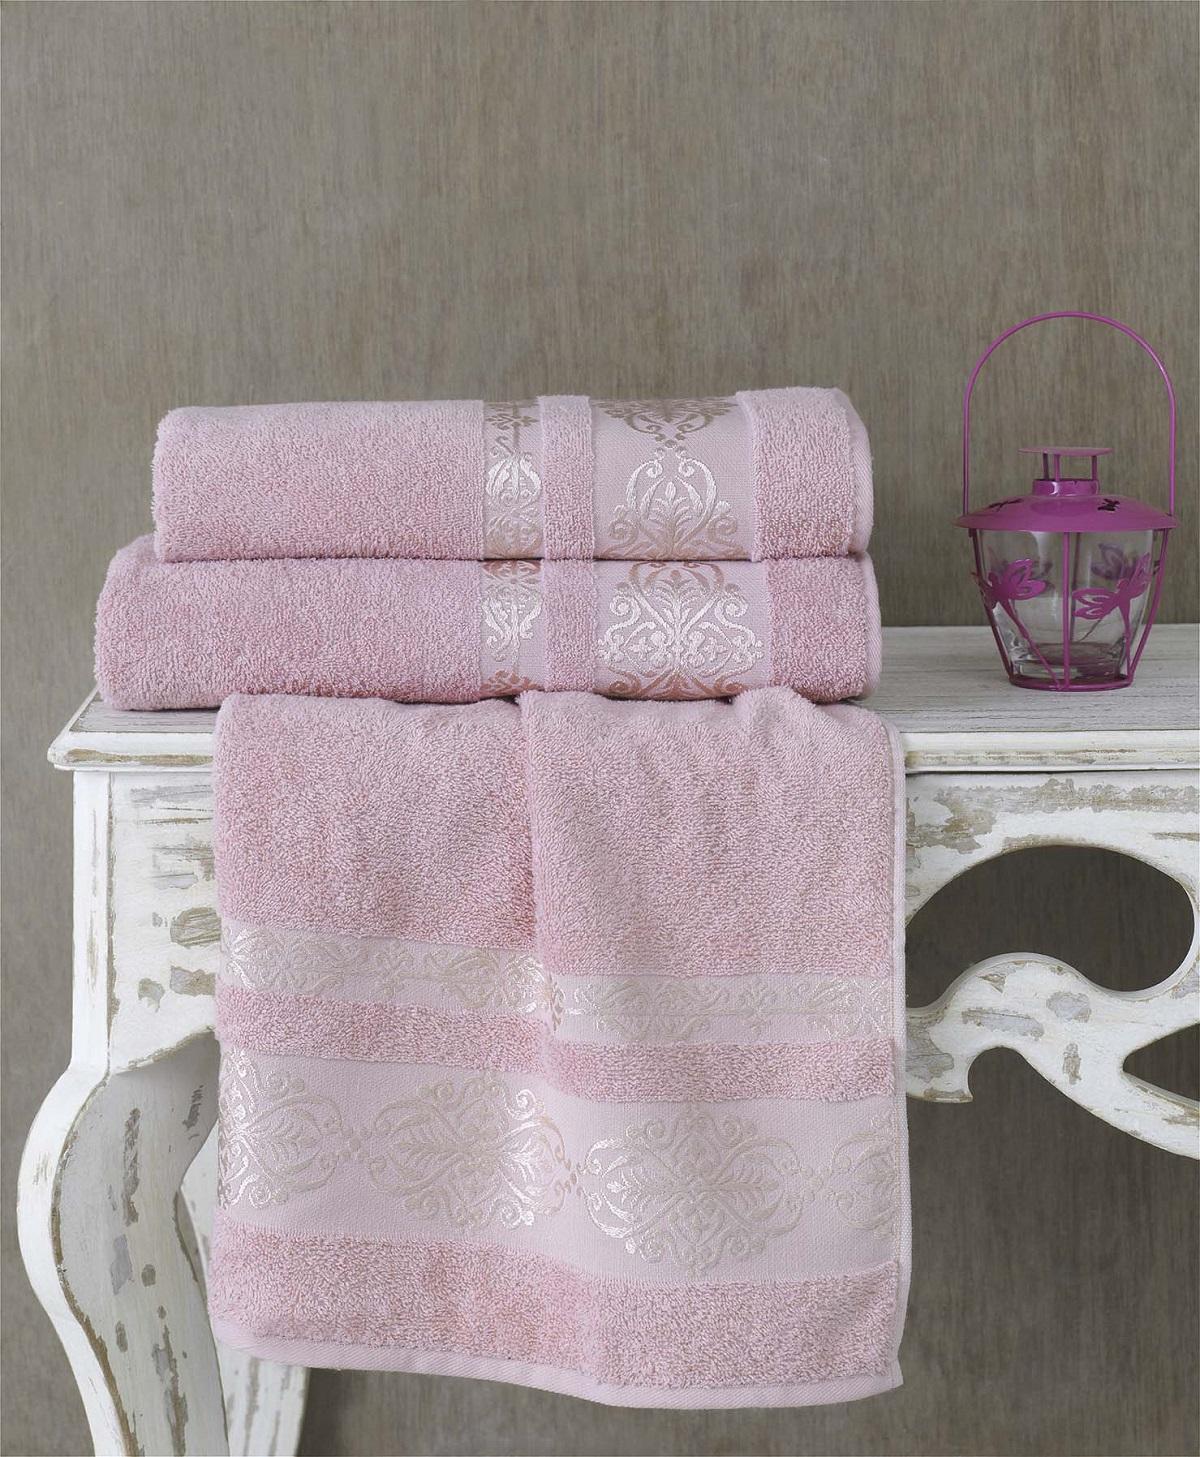 Полотенца Karna Полотенце Rebeka Цвет: Грязно-Розовый (70х140 см) karna karna полотенце innes цвет красный 70х140 см